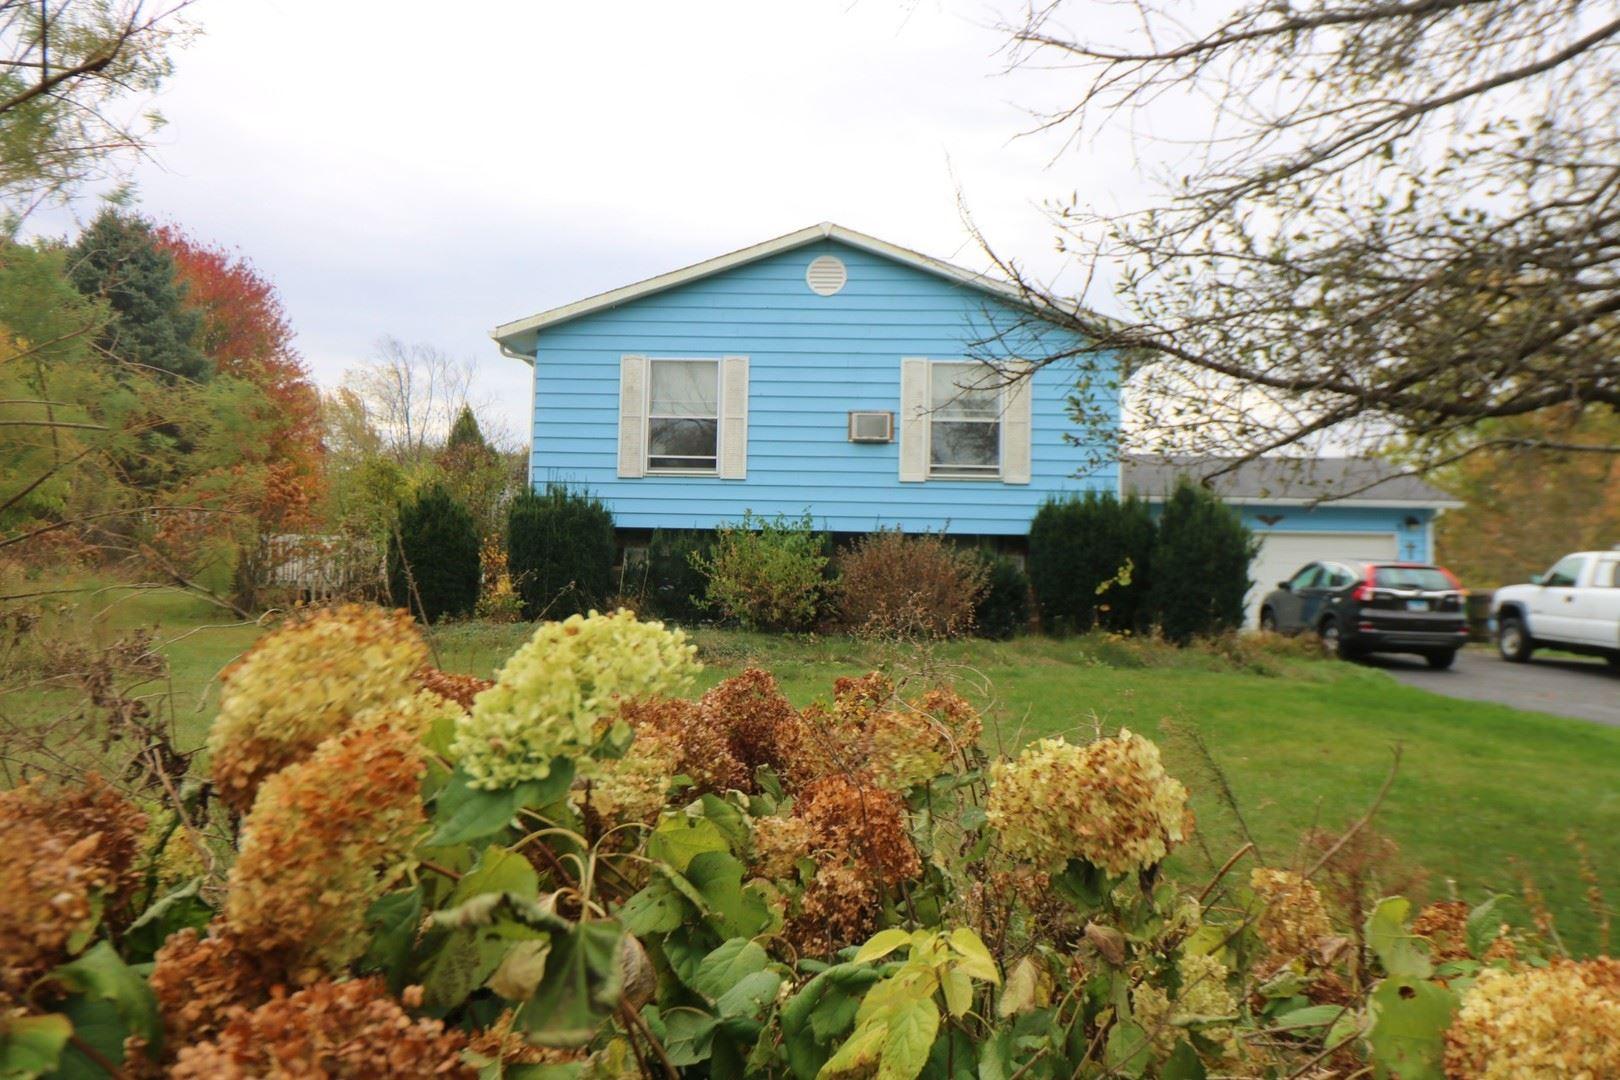 11003 Pheasant Lane, Woodstock, IL 60098 - #: 10915965